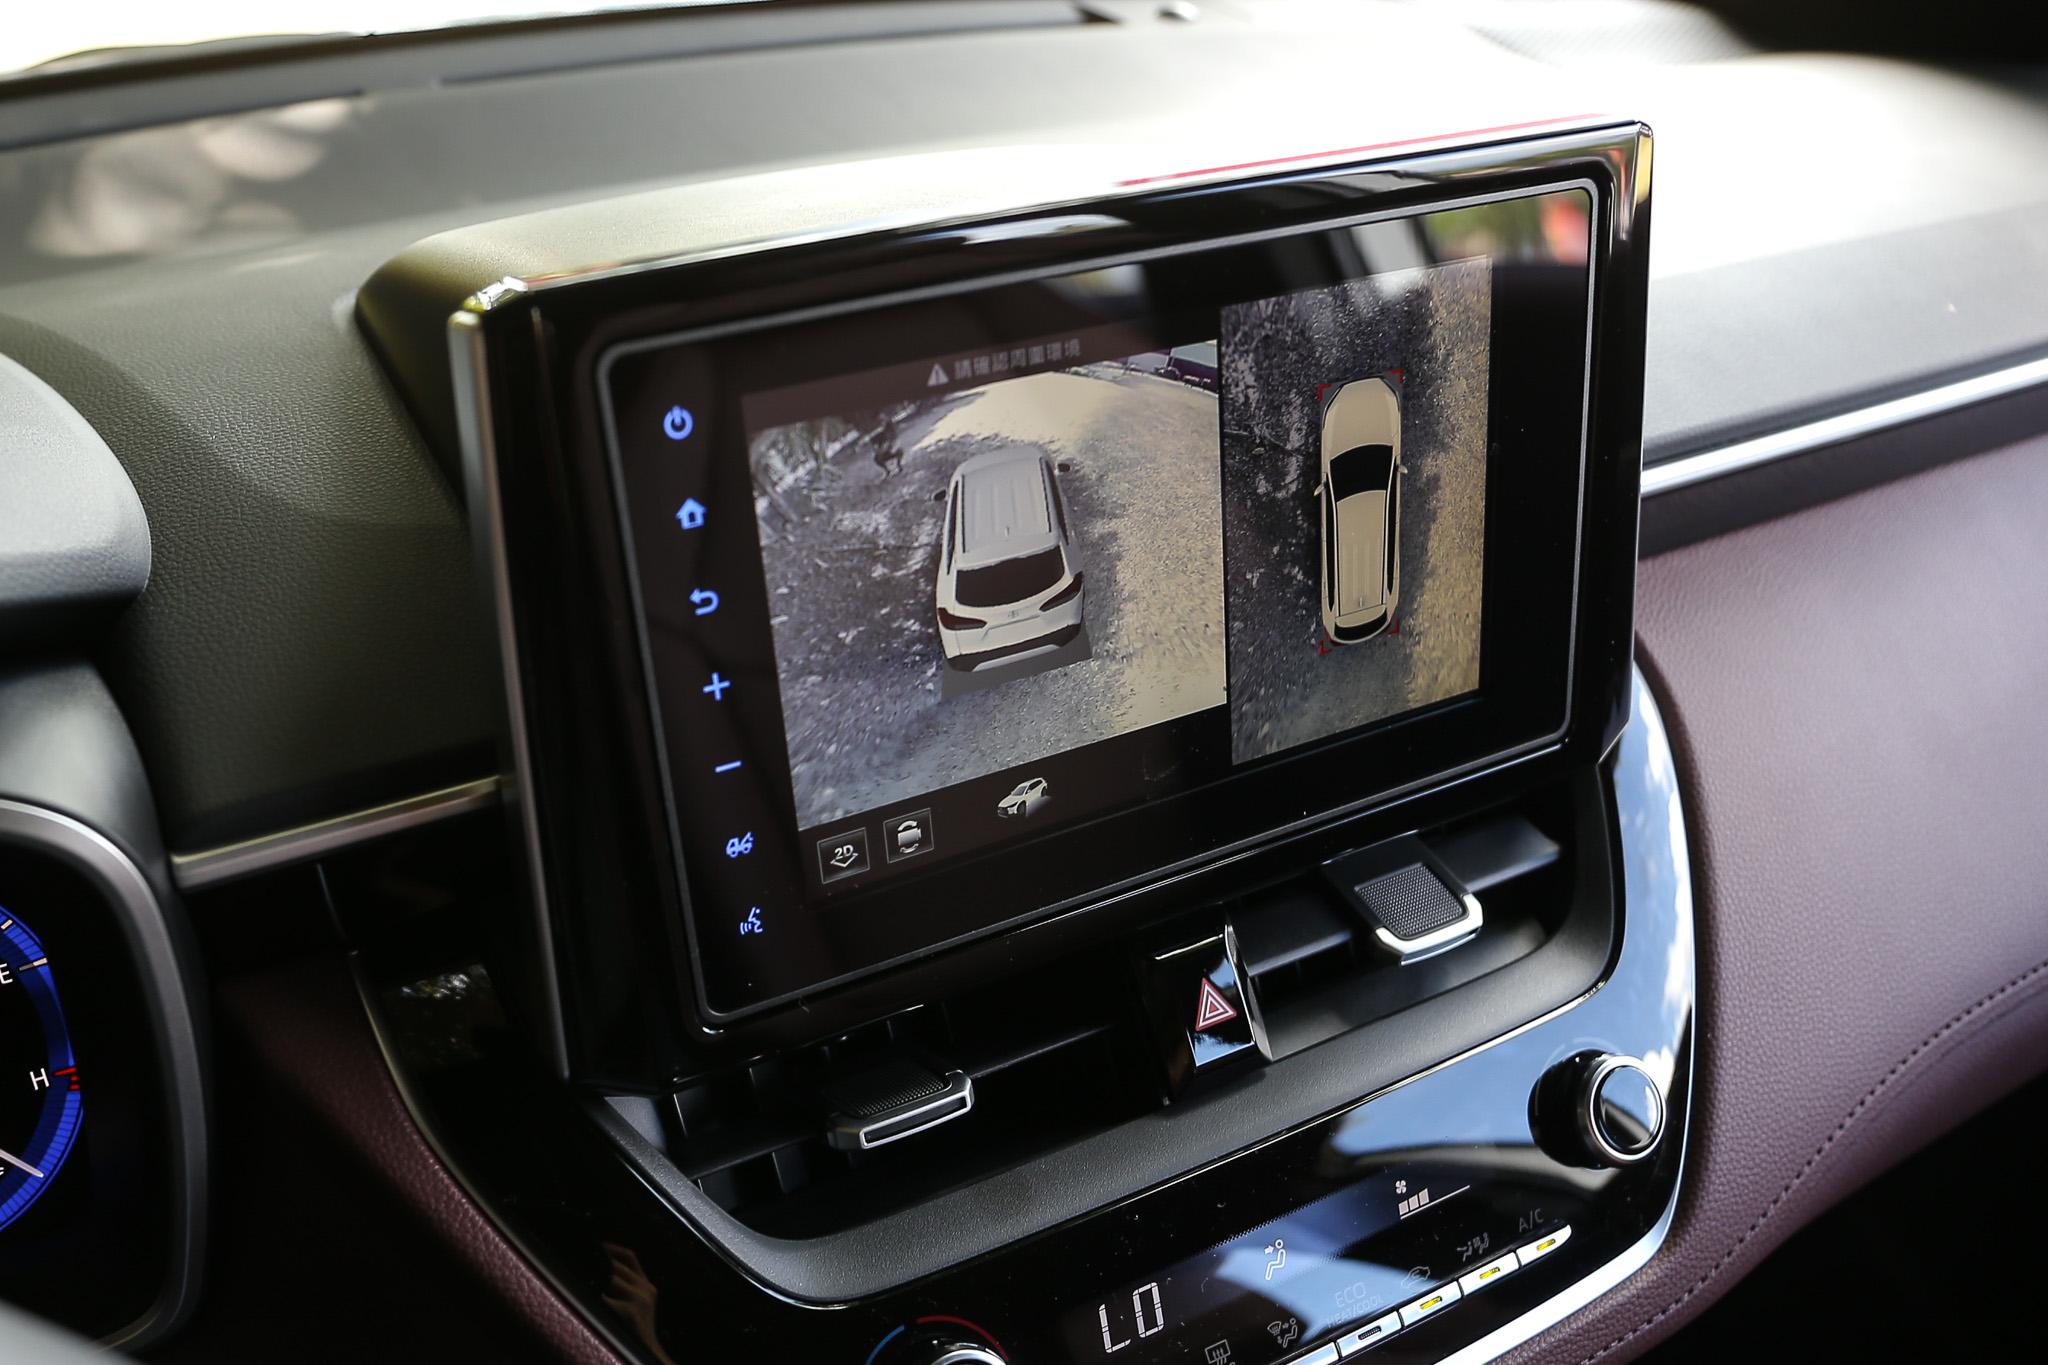 1.8L 油電旗艦款 PVM 環景影像輔助系統。